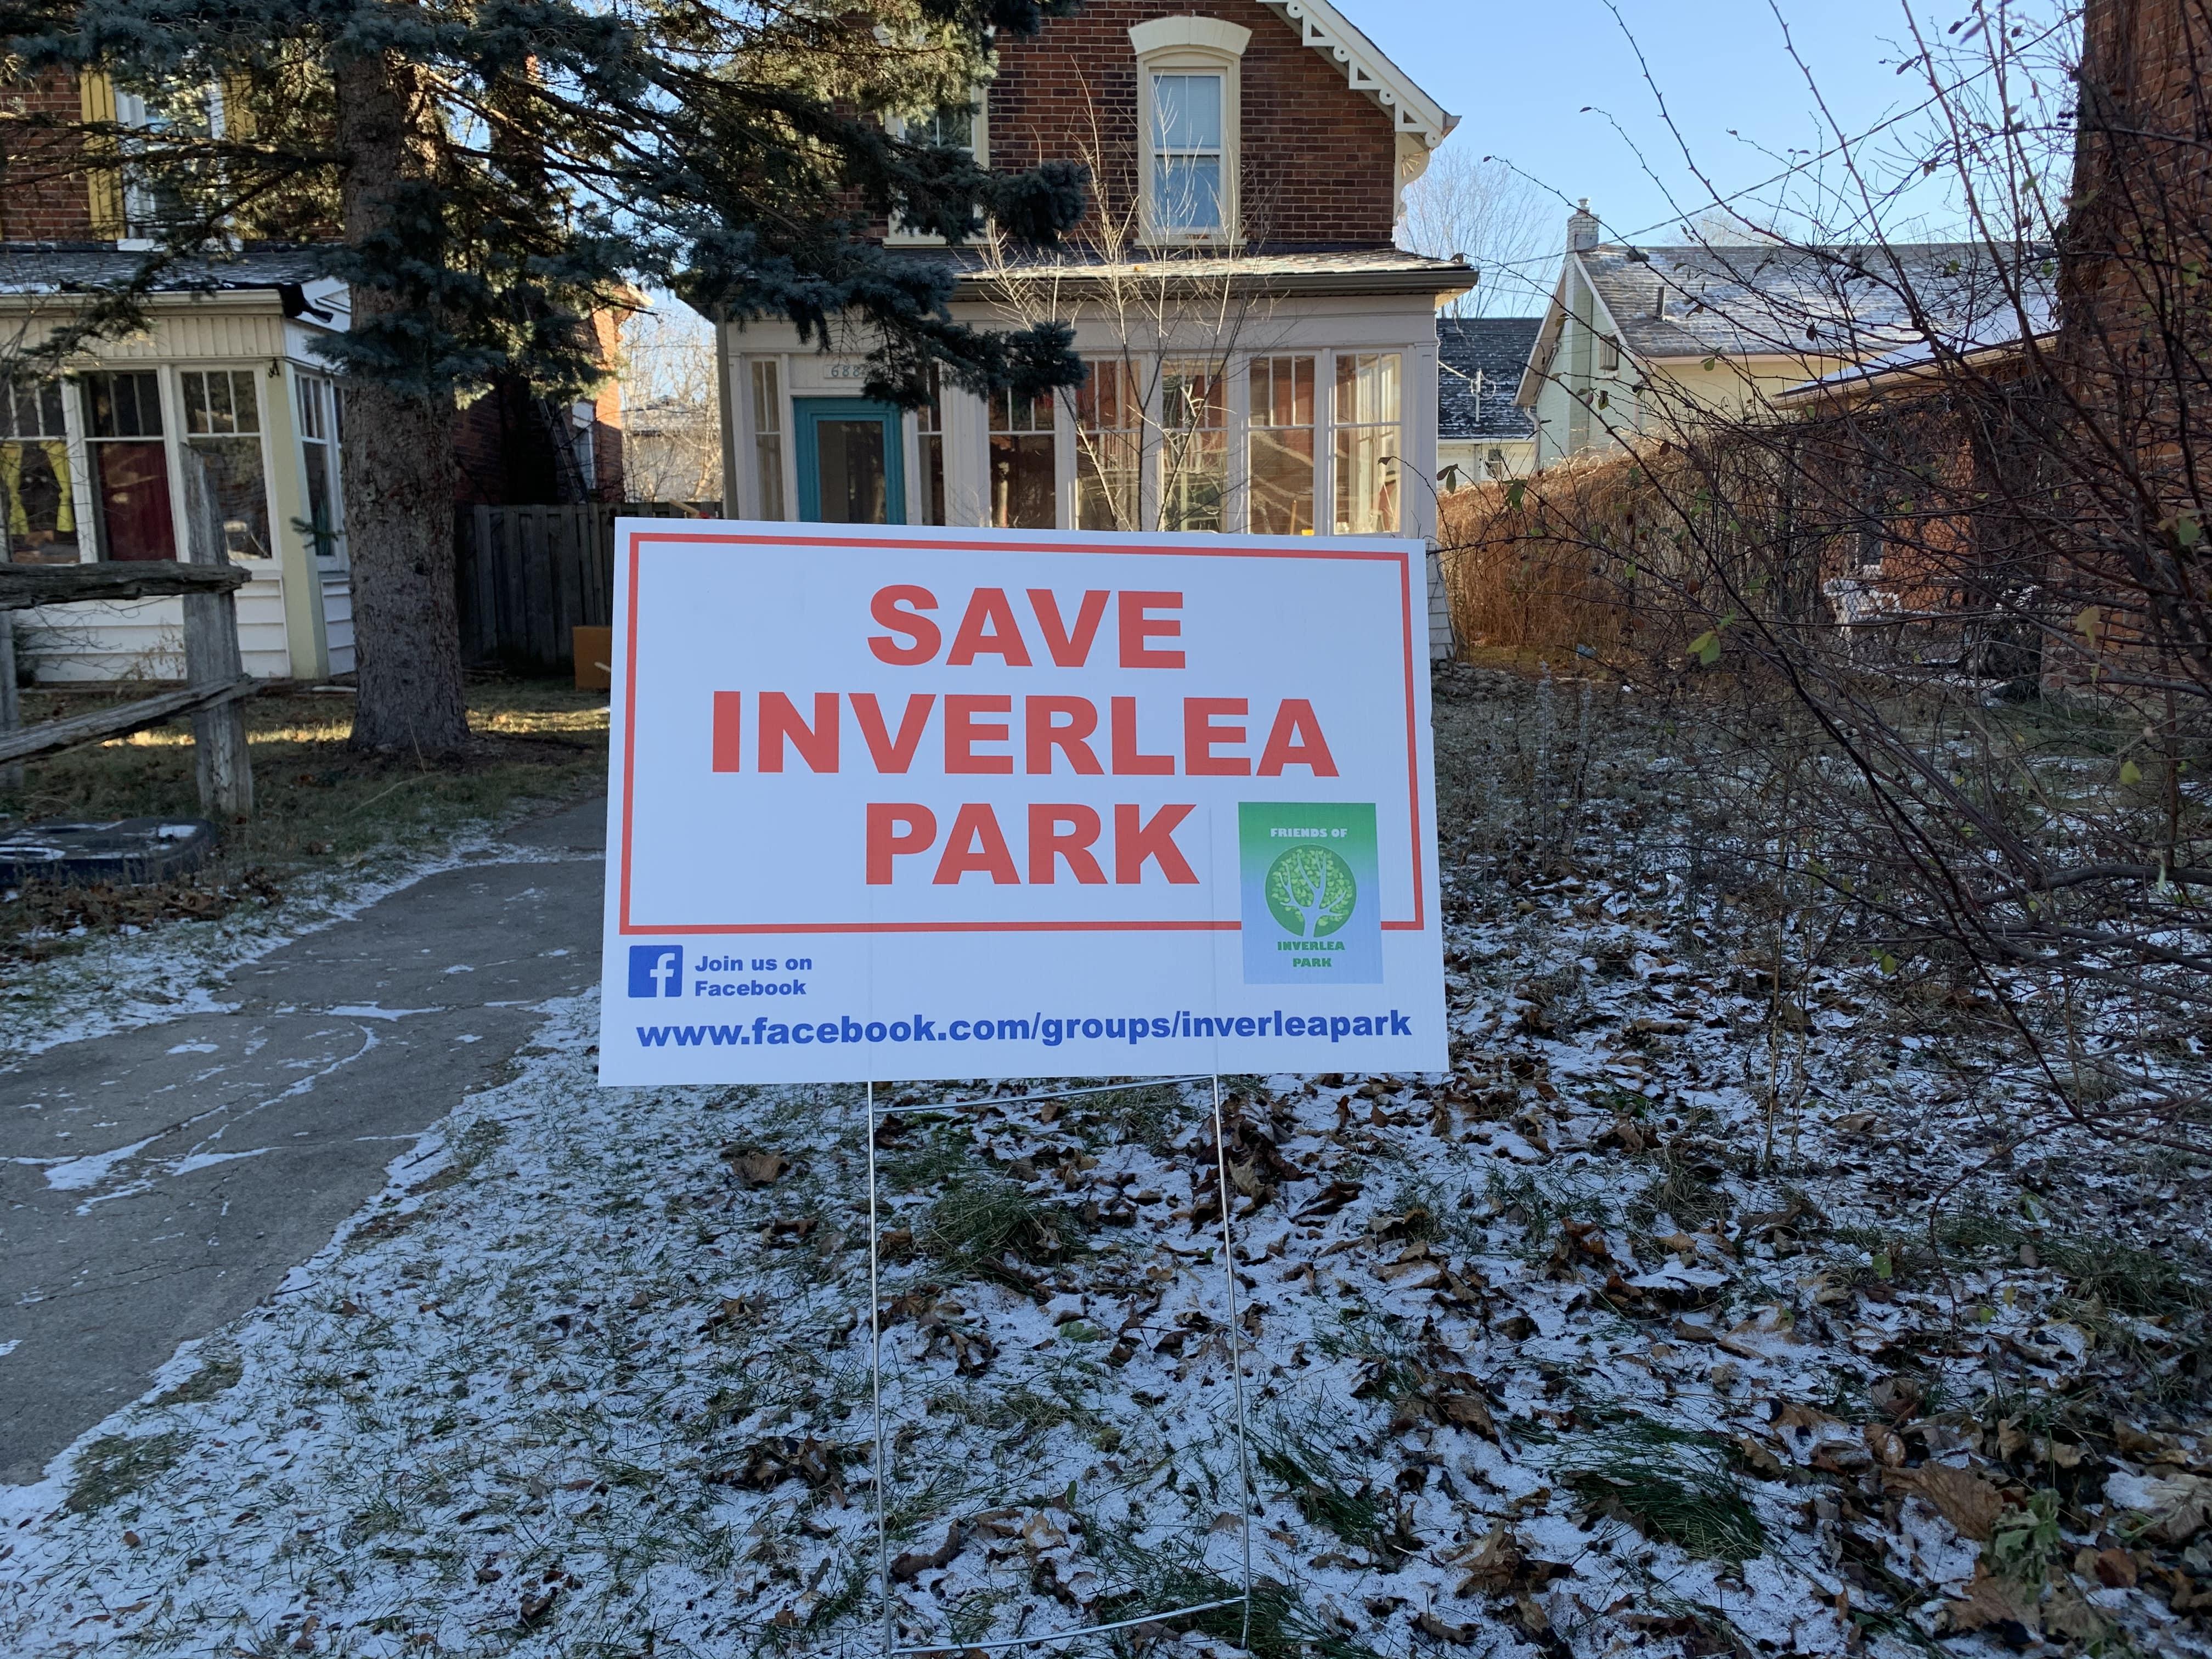 Save Inverlea Park